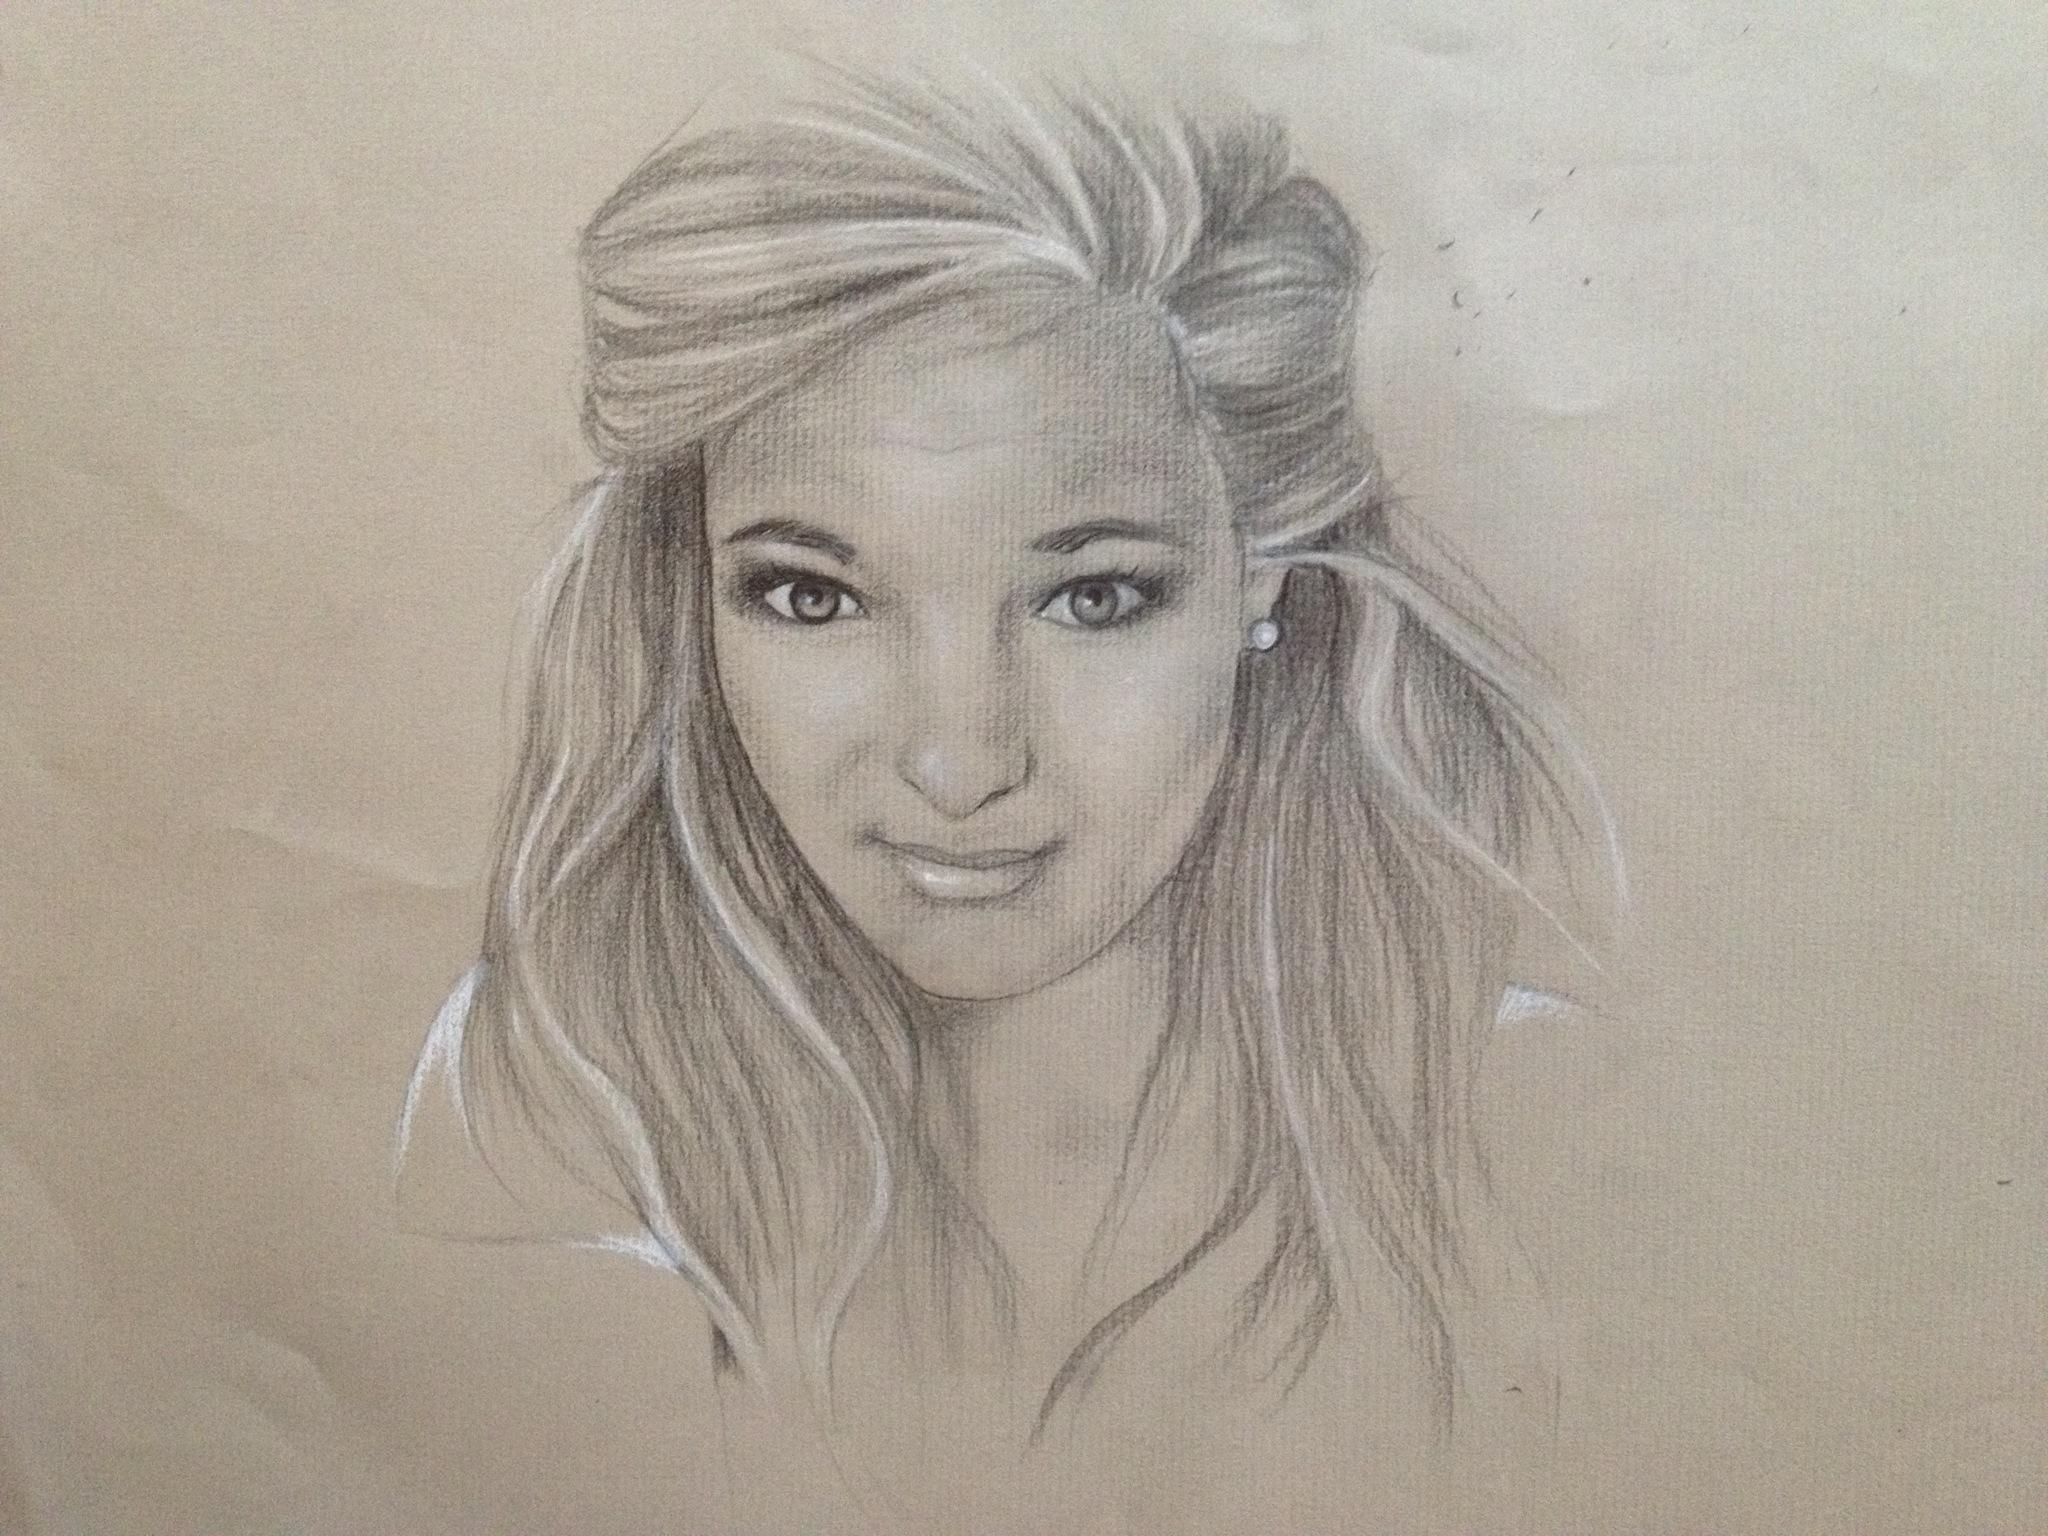 Drawn portrait portait Illustrations Pencil Self and Self